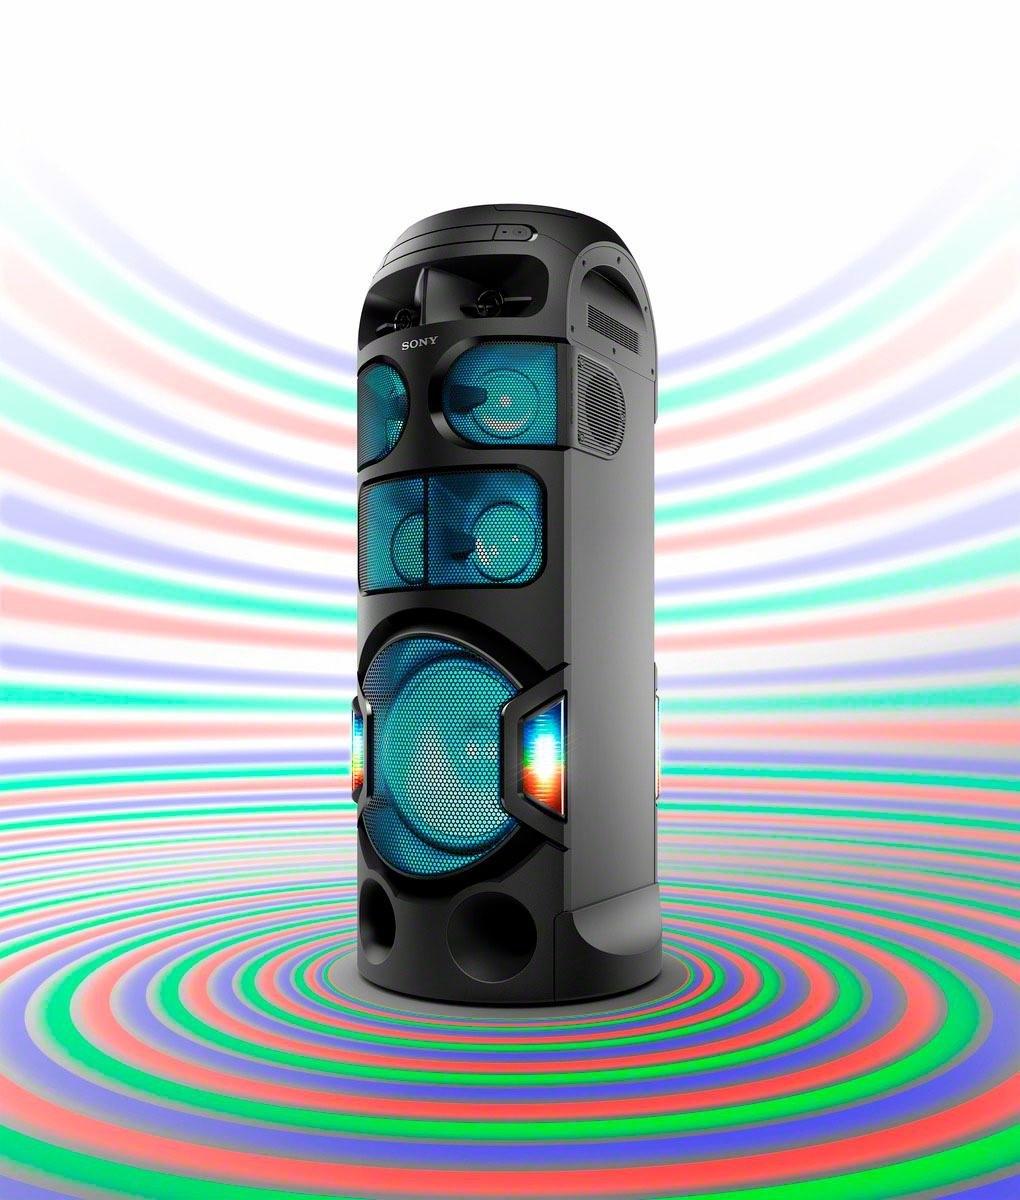 SONY MHC-V81D high power one box music system met 360º geluid & verlichting bestellen: 14 dagen bedenktijd